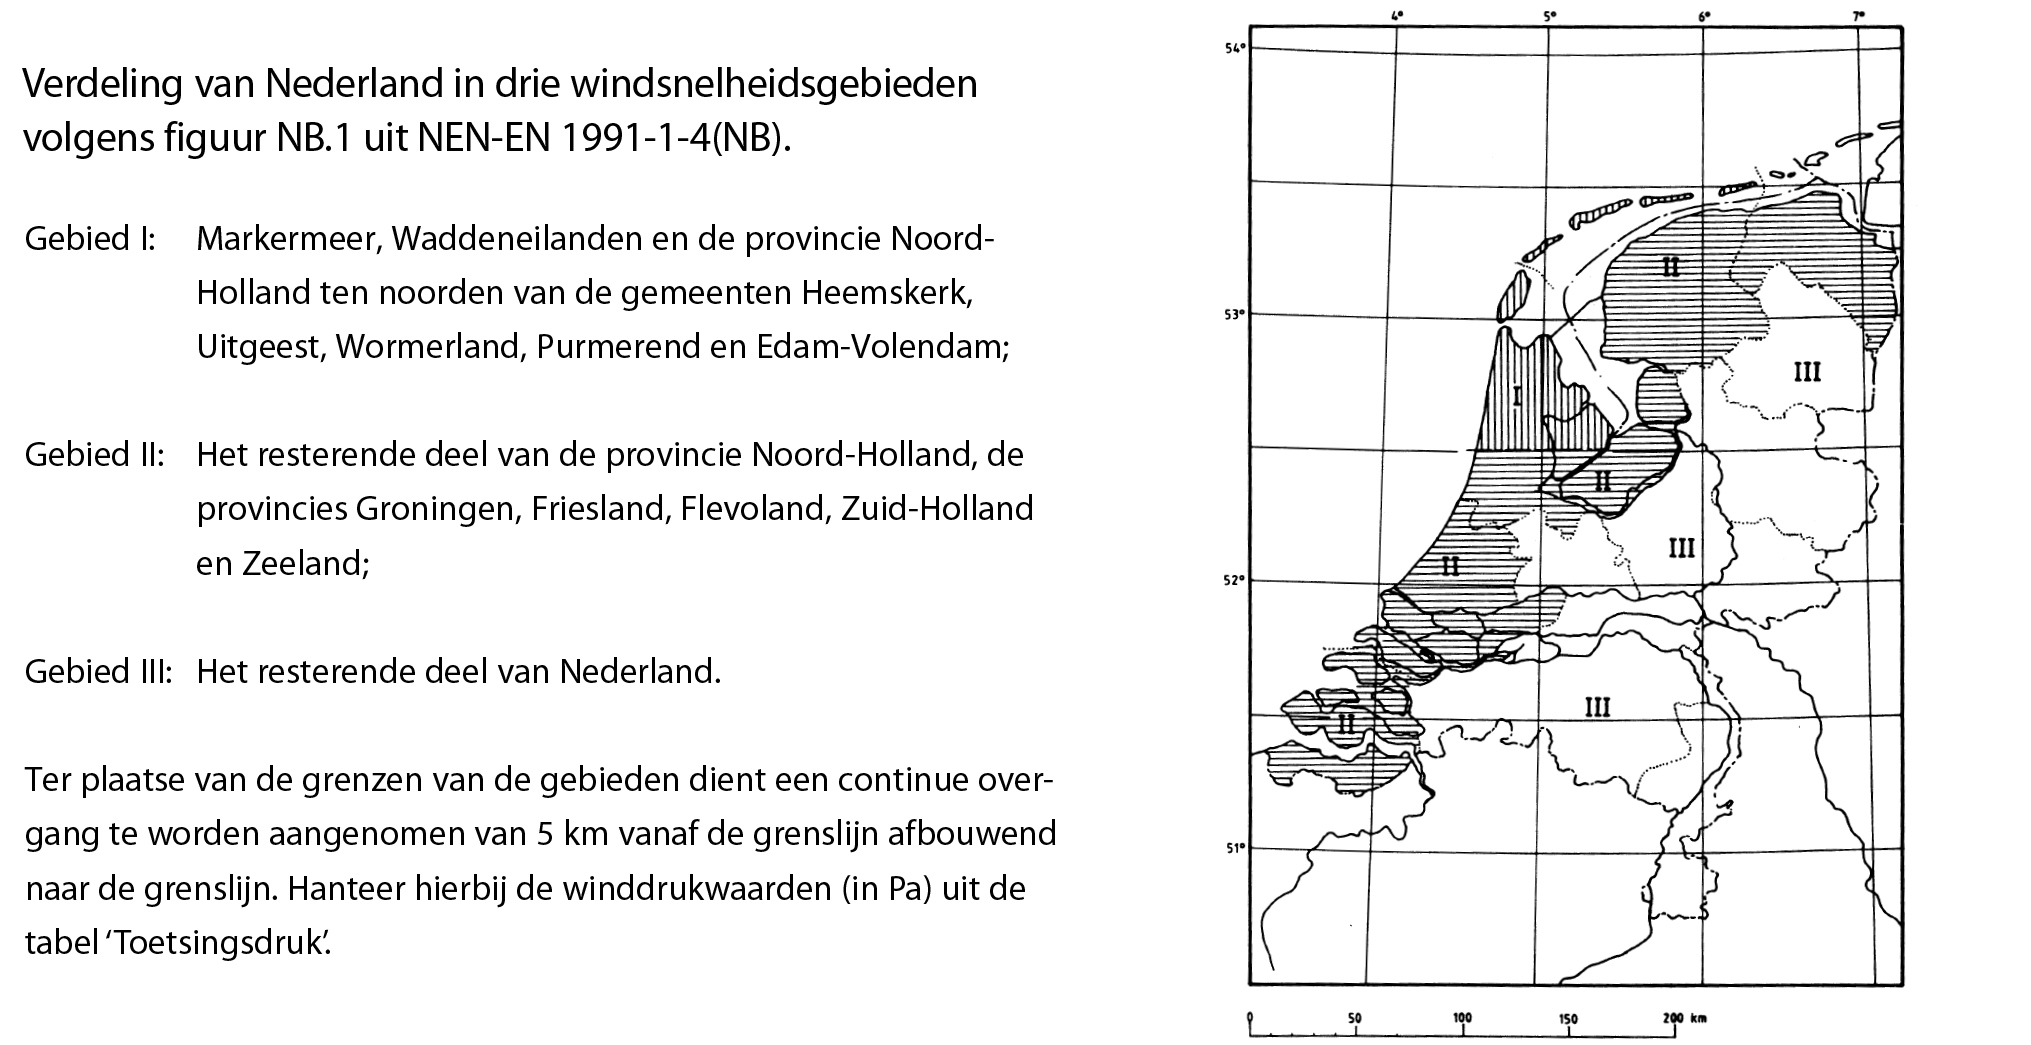 10.4.1.2 Aluminium_Functionele-Eisen_Luchtdoorlatendheid_Vliesgevels_WindsnelheidsgebiedenNL.jpg